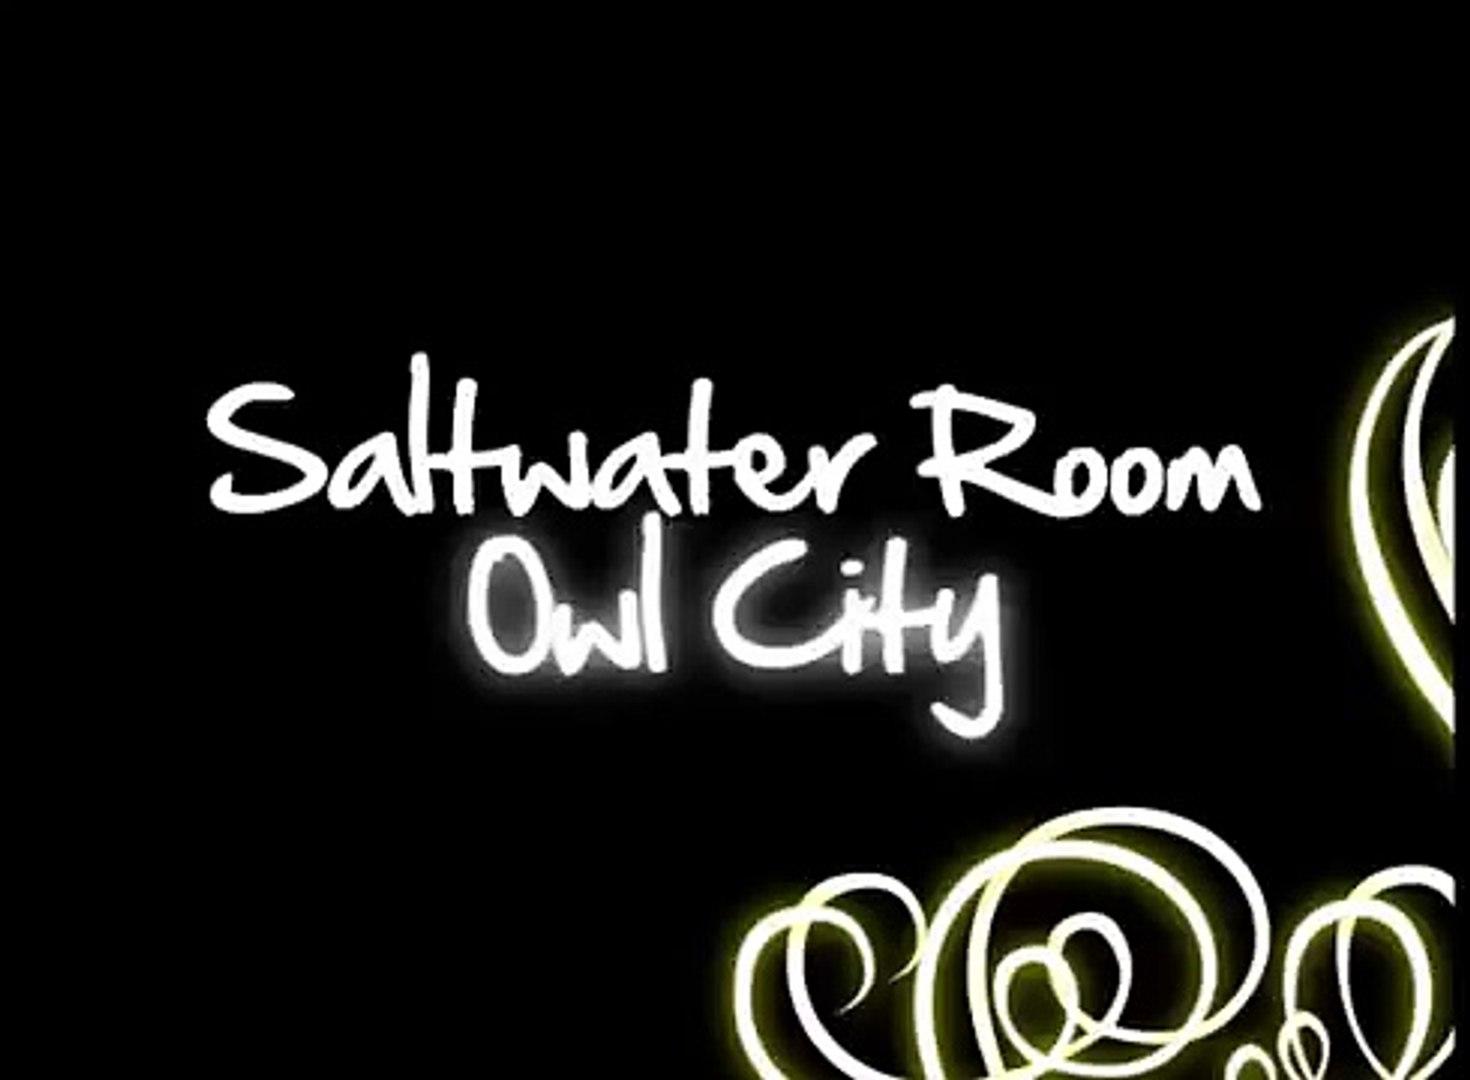 Owl City R Room Lyrics